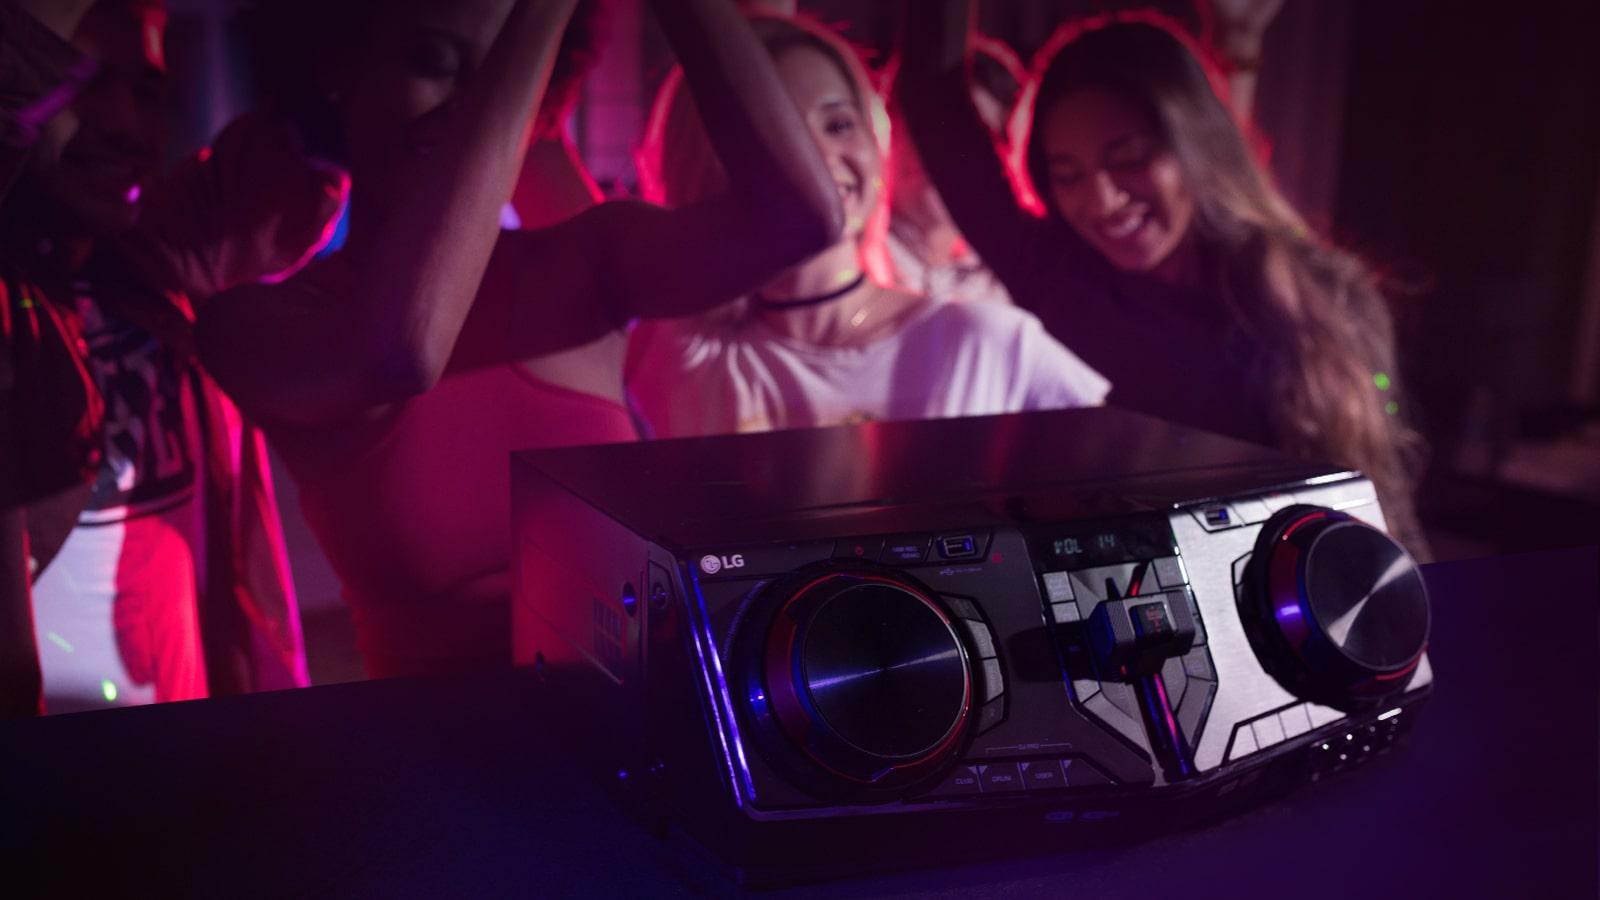 Equipo Alto Voltaje 3500w Usb Dj Y Karaoke Star Lg España